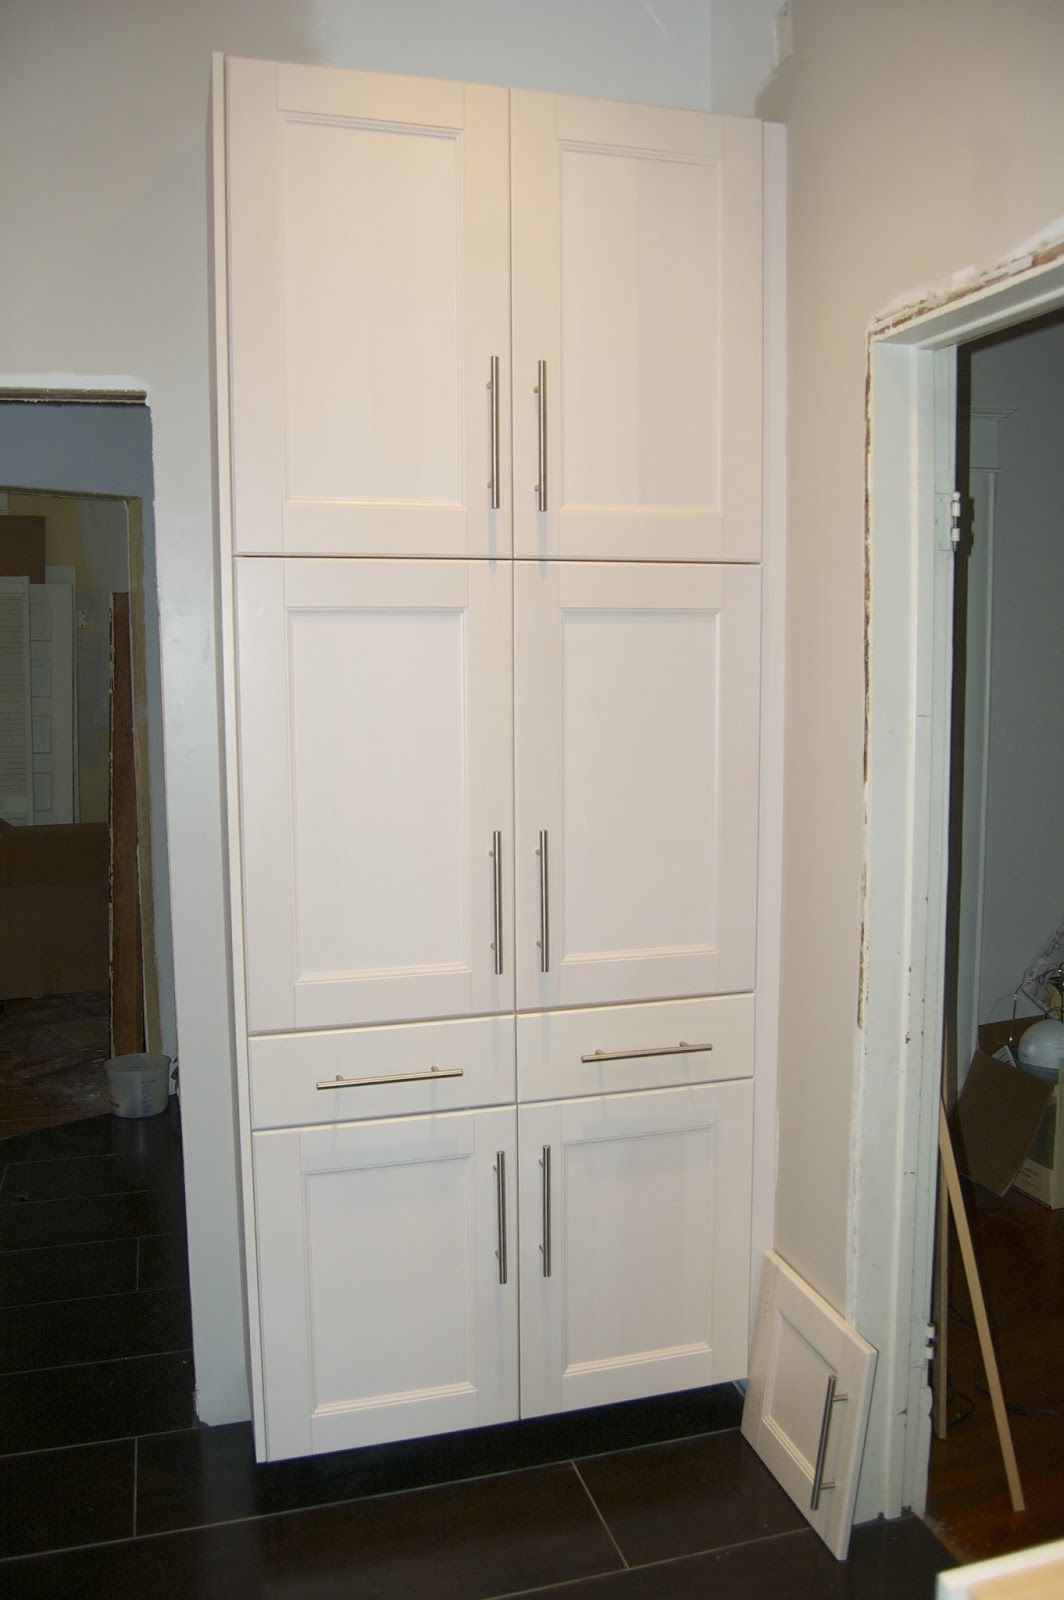 Tall White Kitchen Pantry Cabinet1 Kitchen Pantry Storage Cabinet Tall Kitchen Pantry Cabinet Ikea Kitchen Storage Cabinets